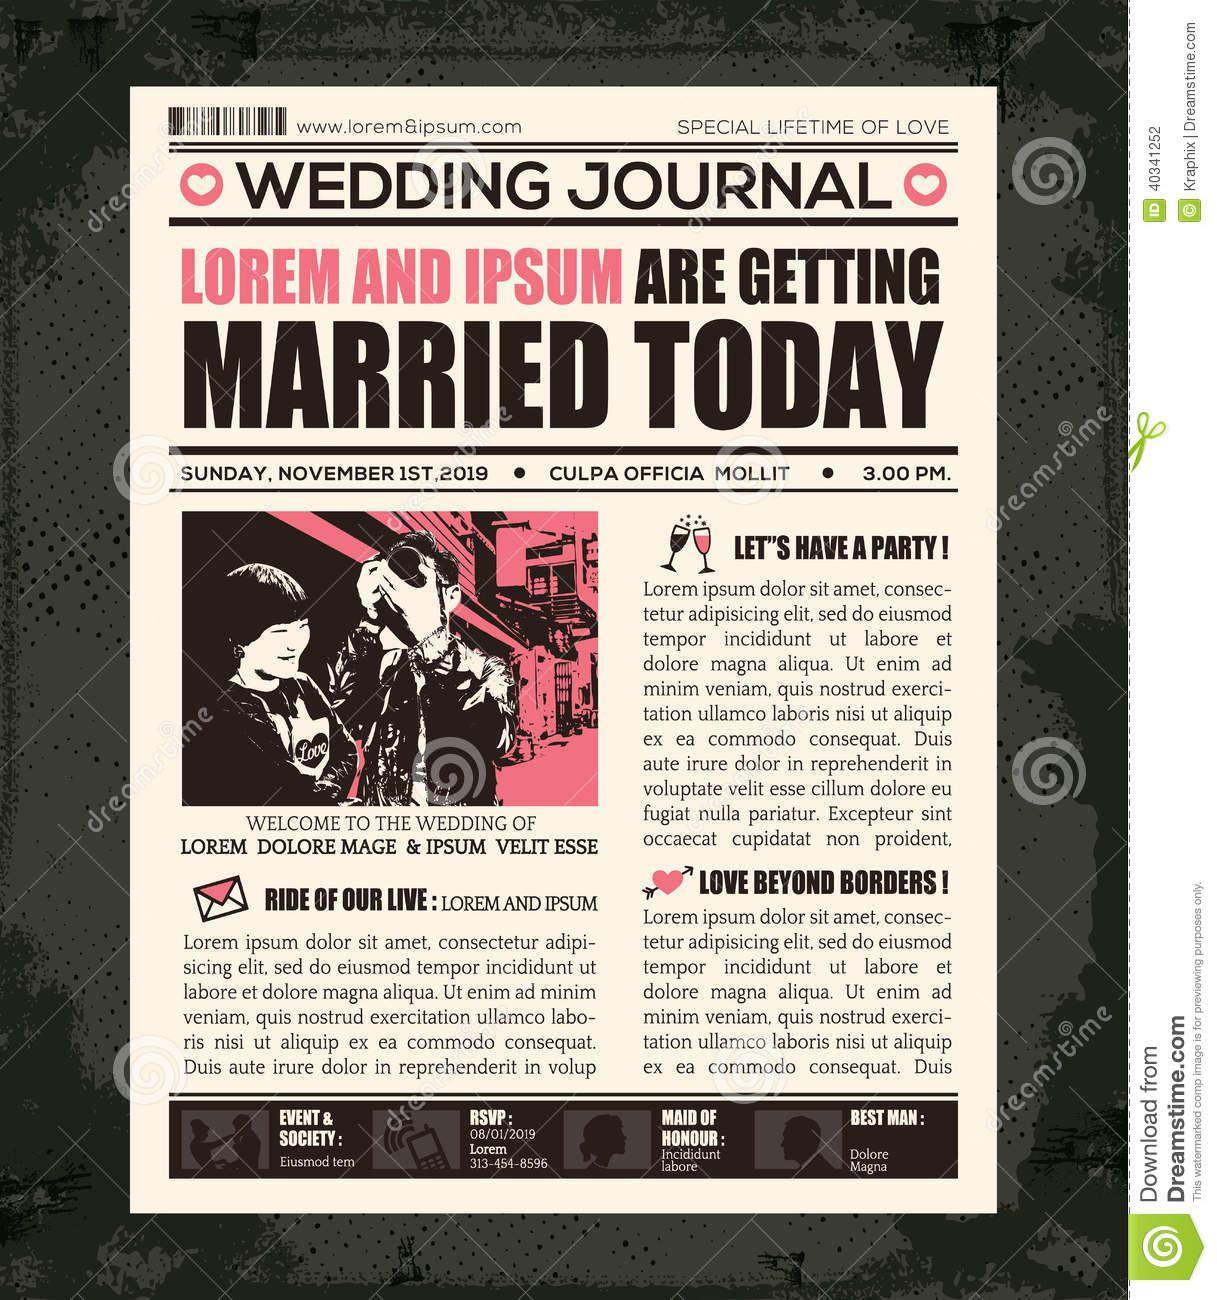 vintage wedding card design template%0A Newspaper Wedding Invitation Design Template Stock Vector  Image